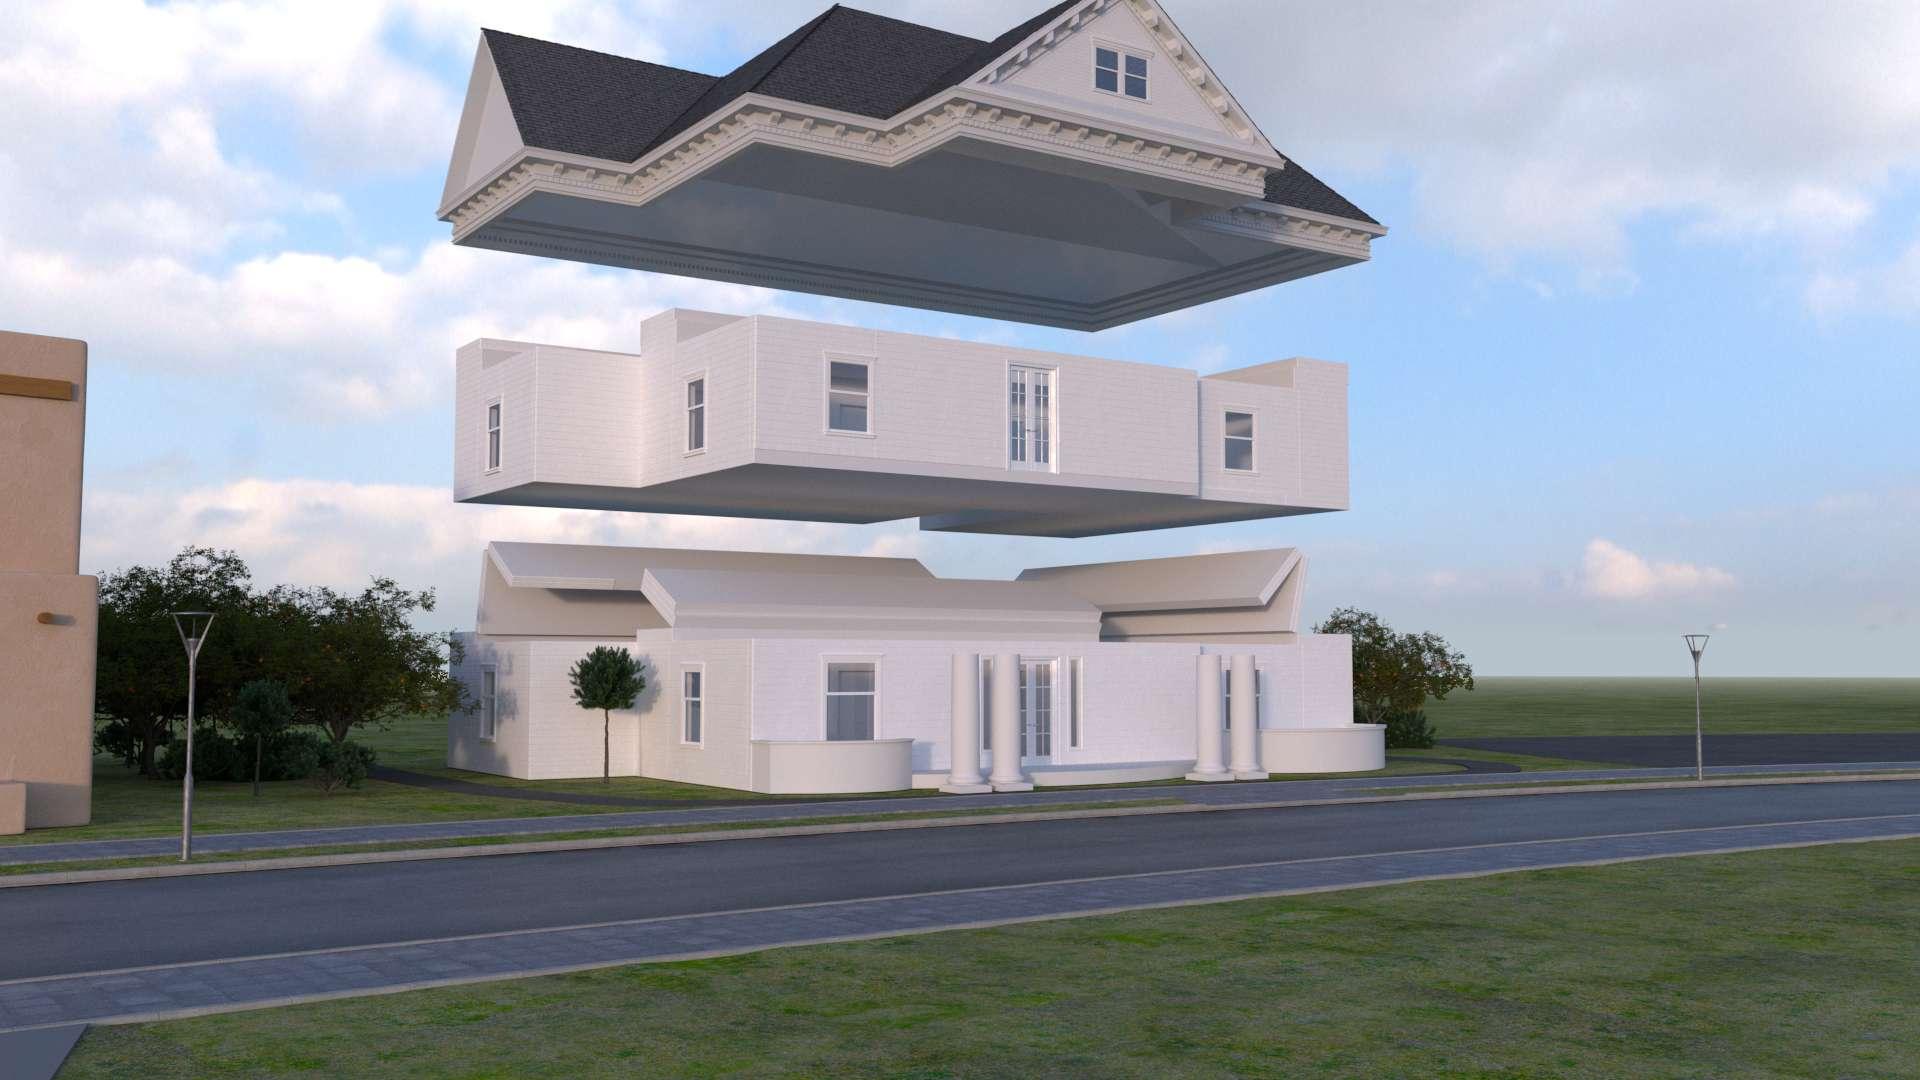 McMansion design